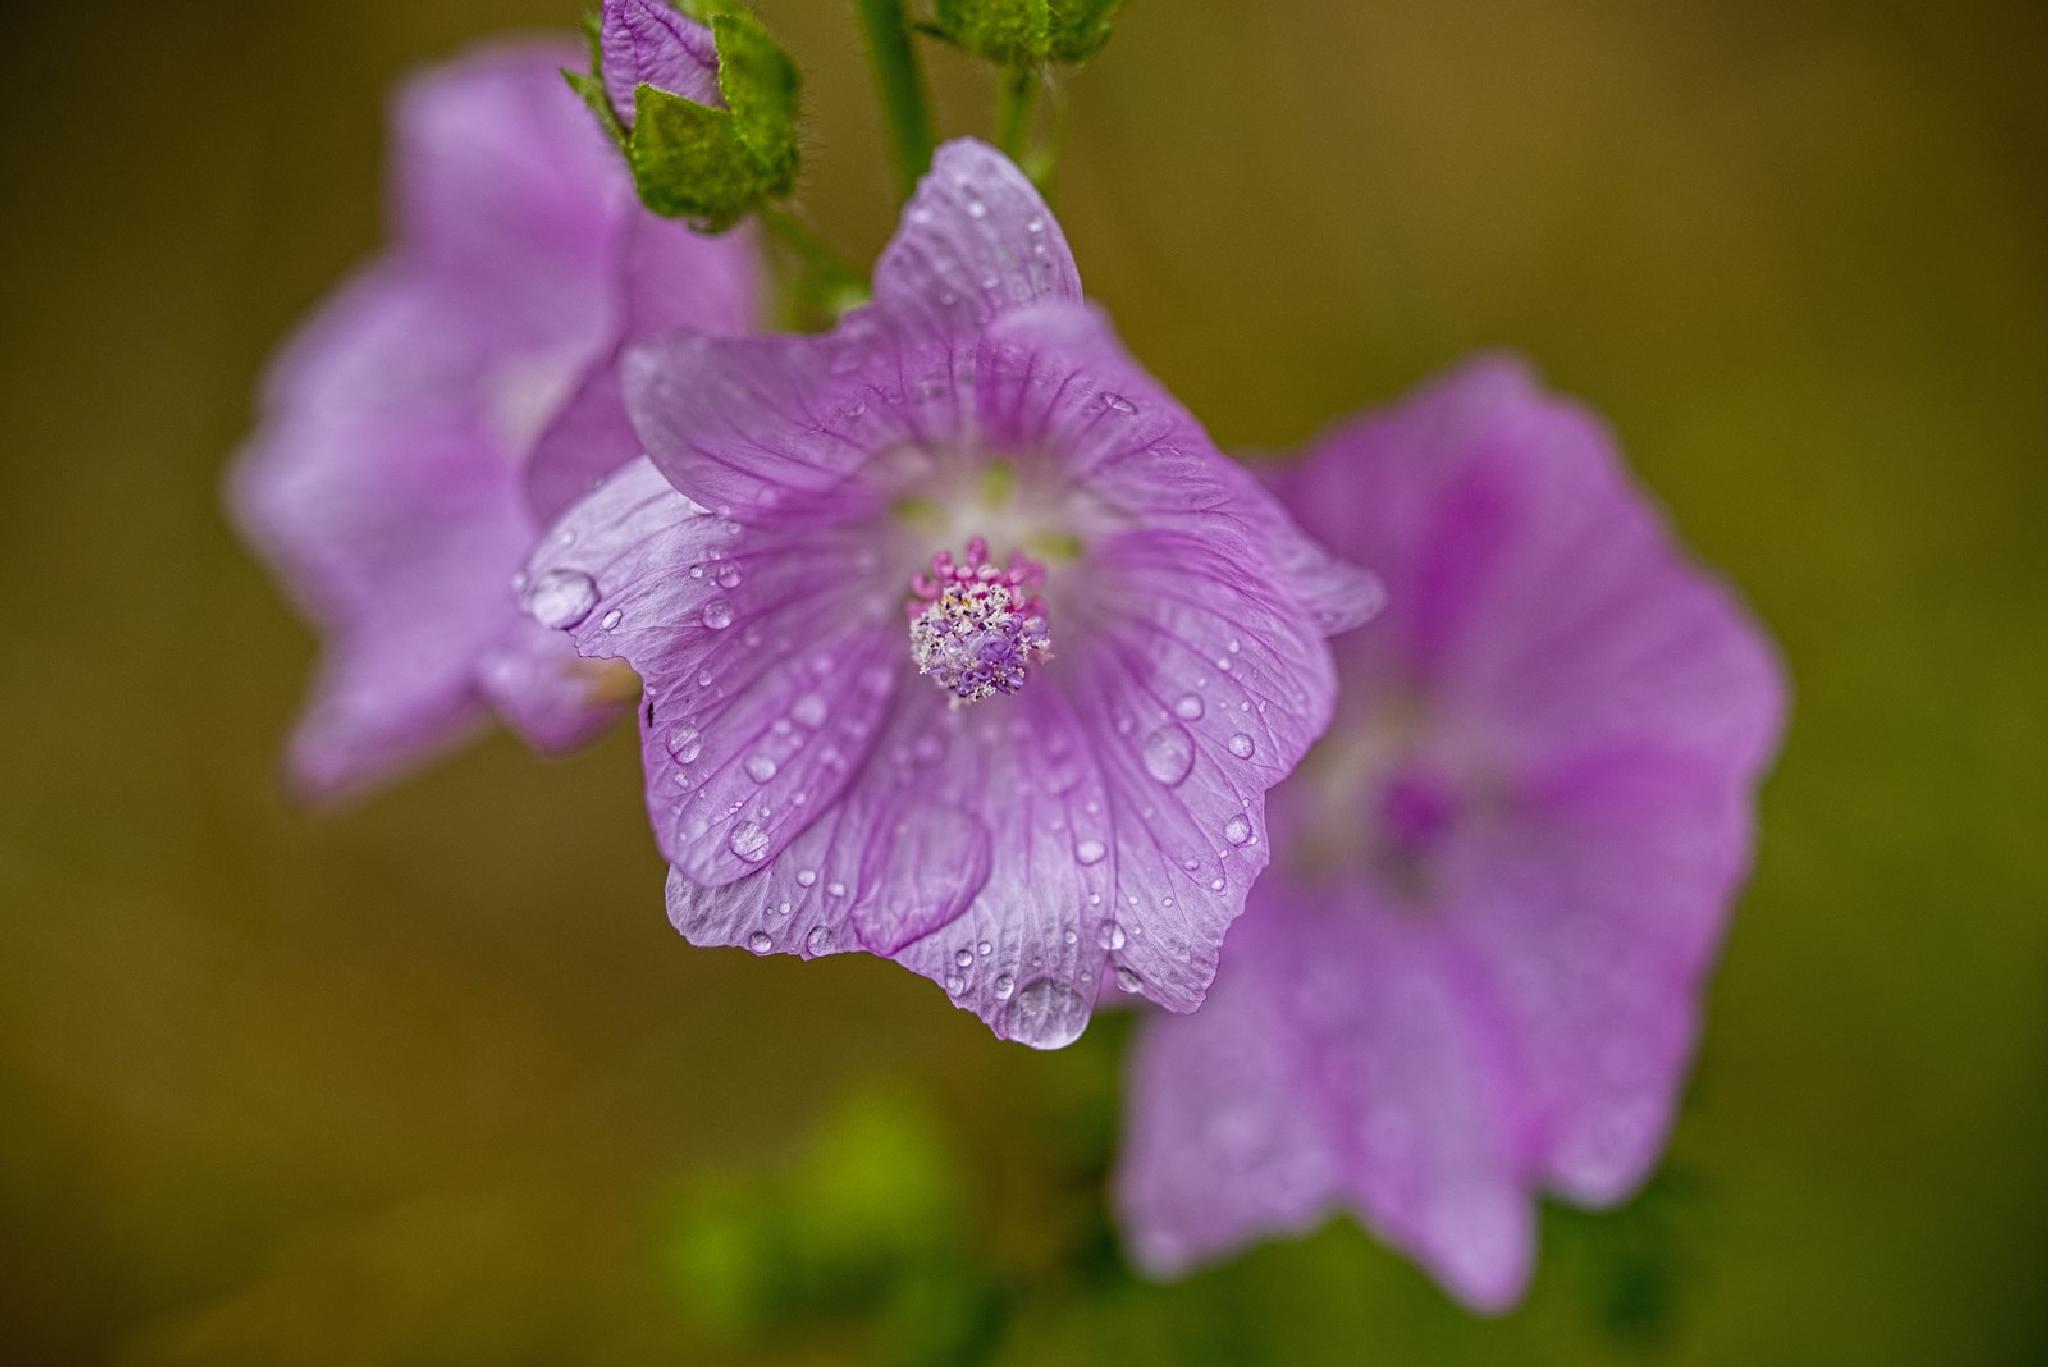 After rain_01 by Waldemar Sadlowski